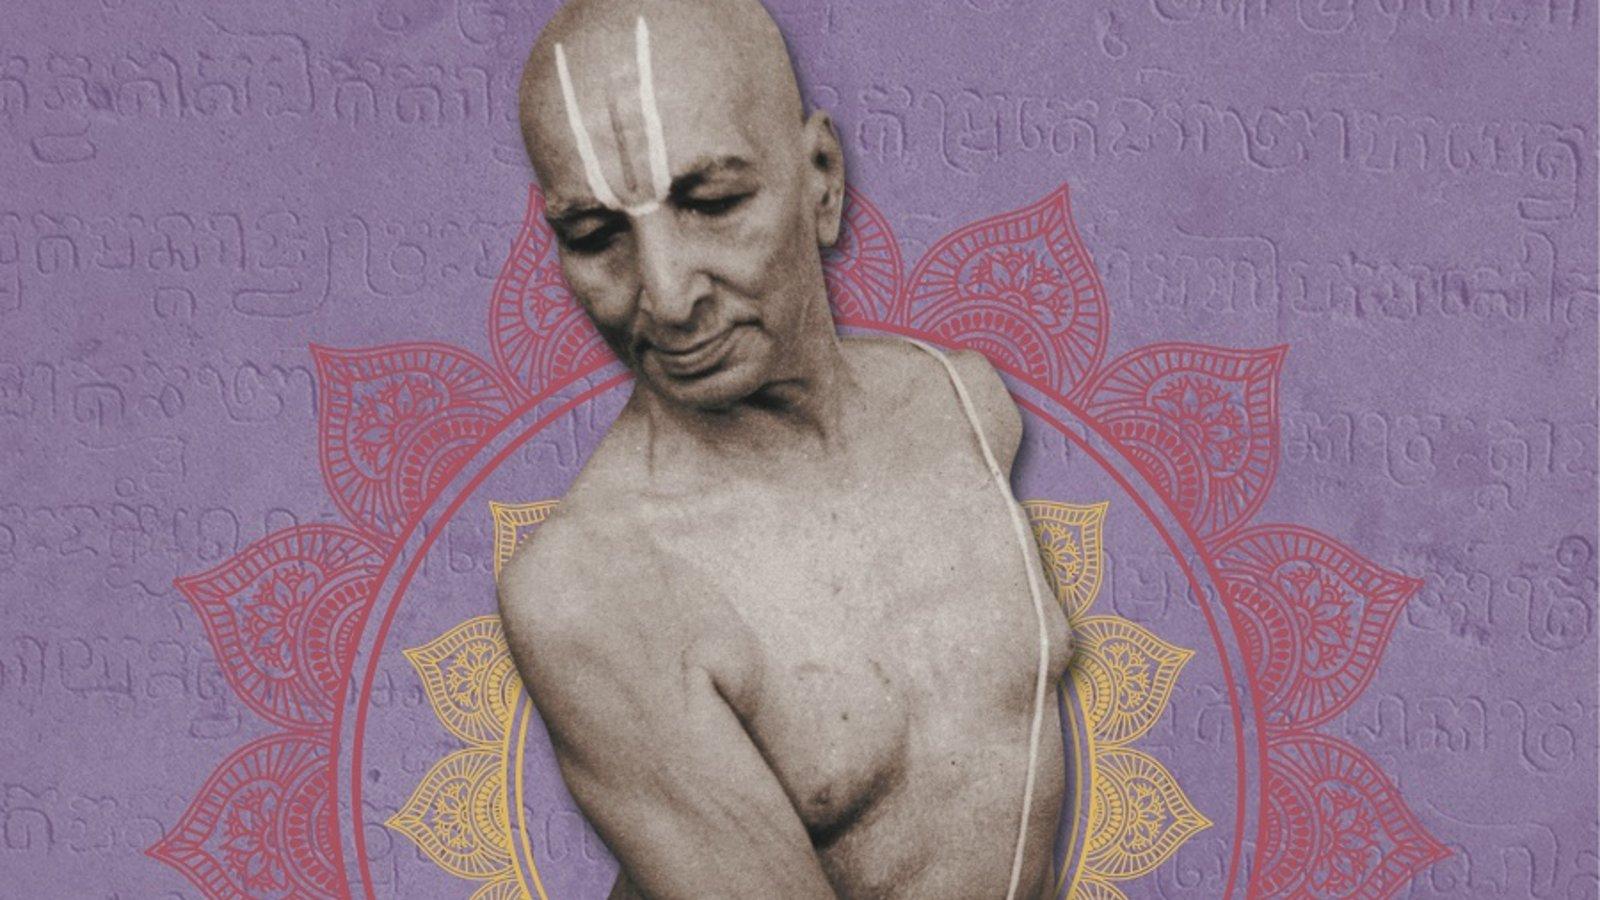 Breath Of The Gods - The Origins of Yoga